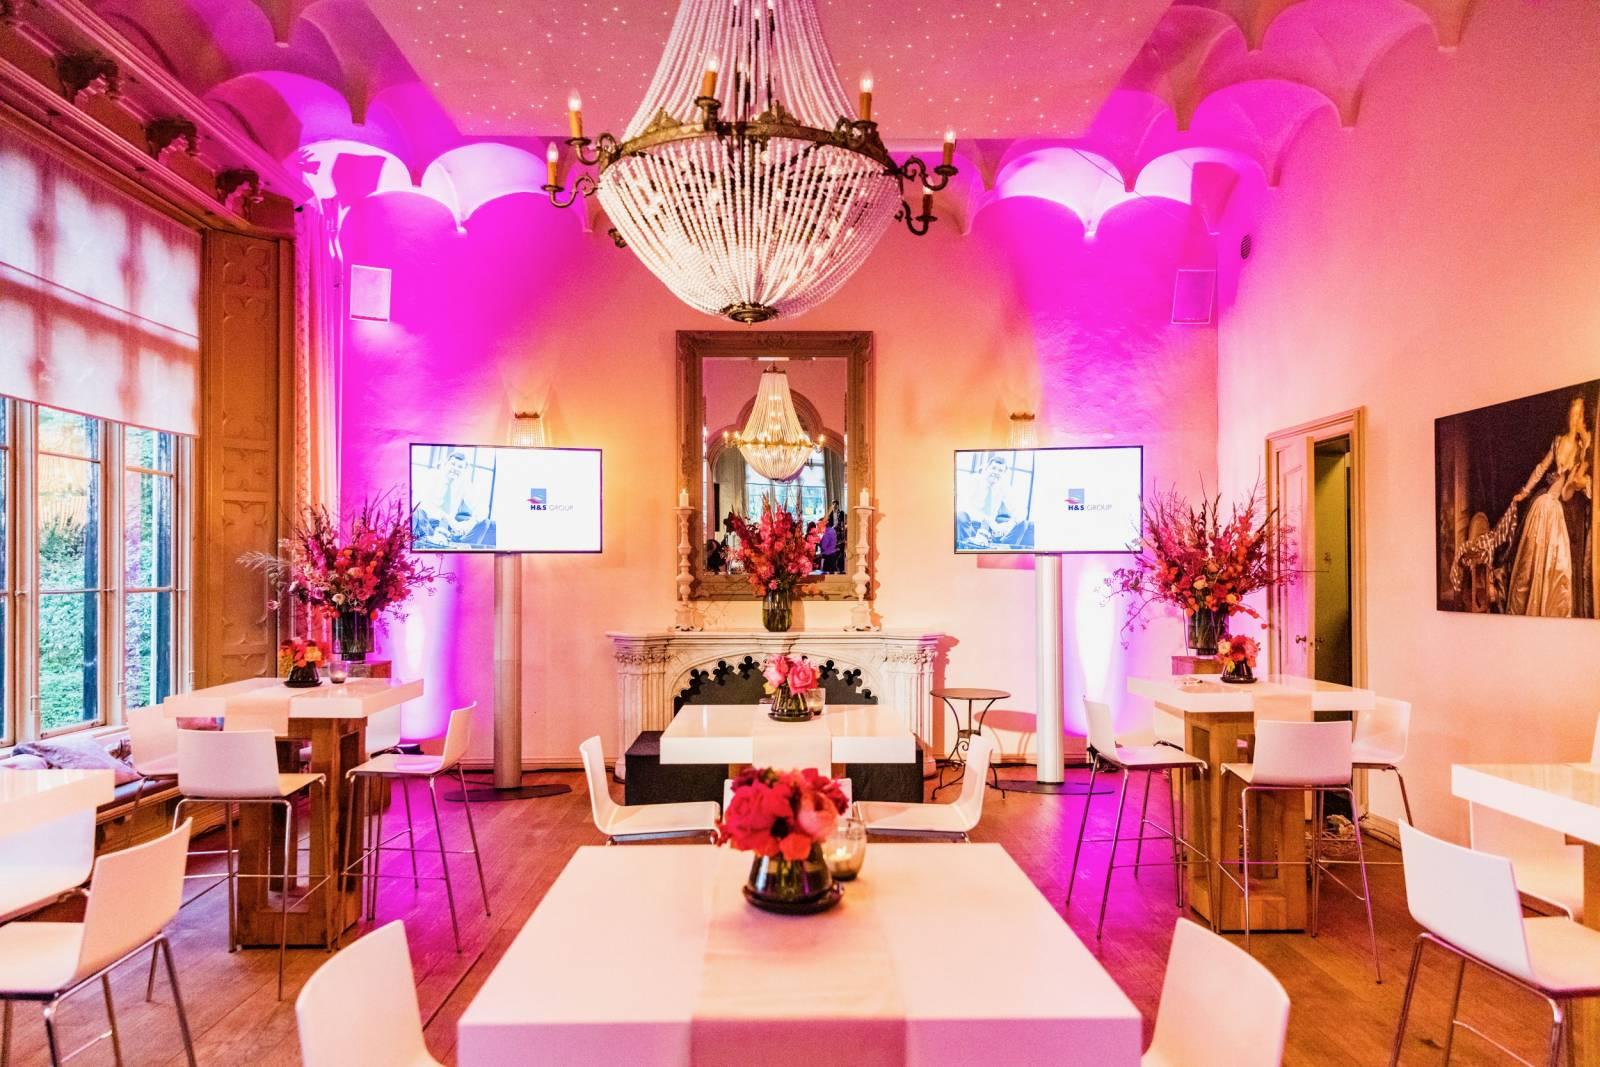 Wolterinck Event Decoration - Verhuur & Decoratie - House of Events - 28